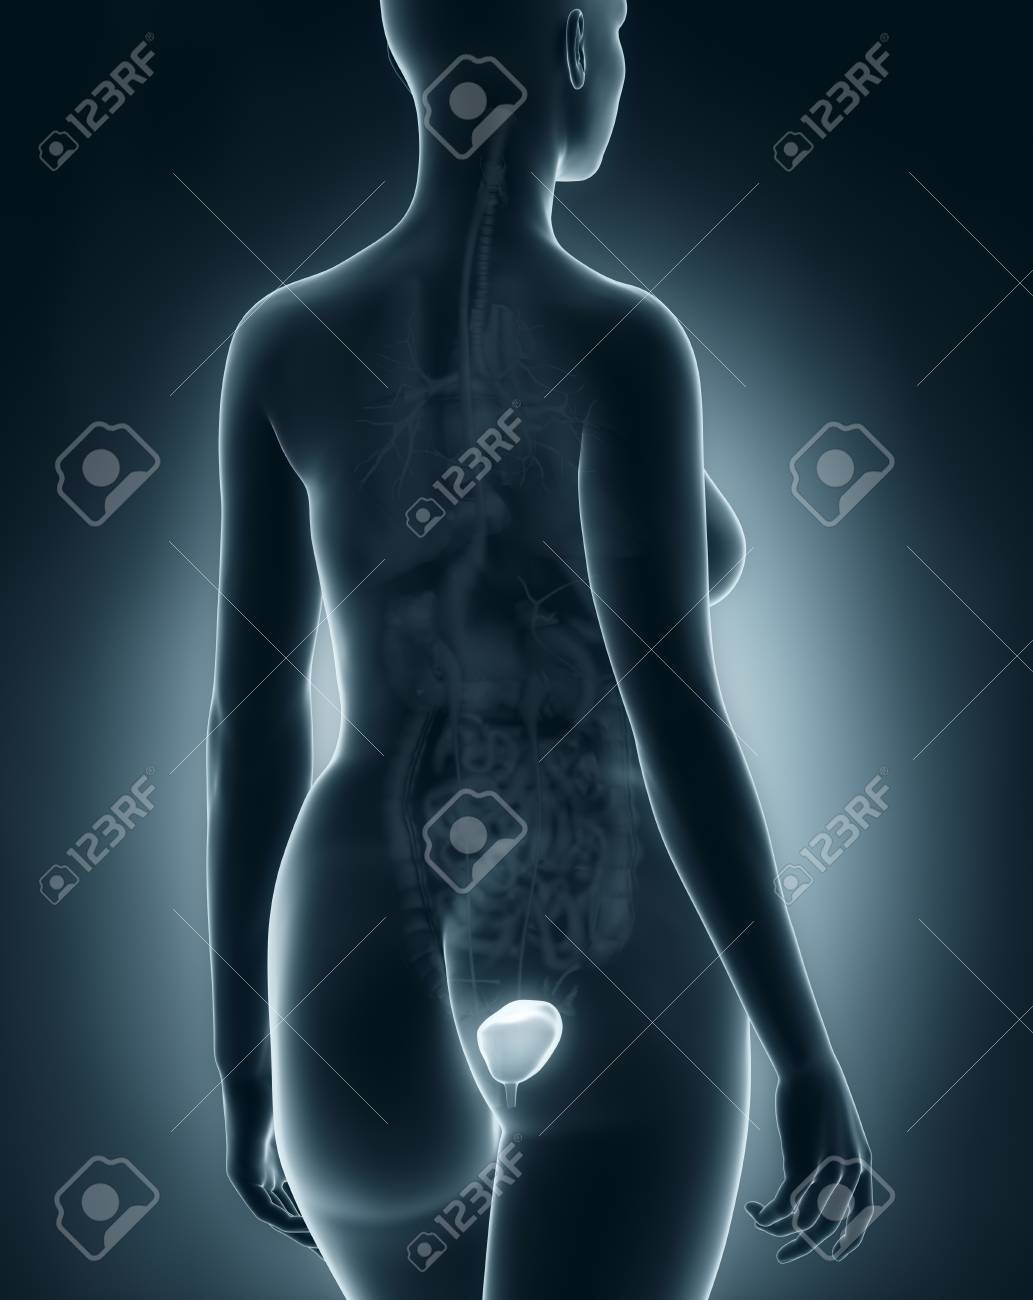 Female Bladder Anatomy X Ray Black Posterior View Stock Photo